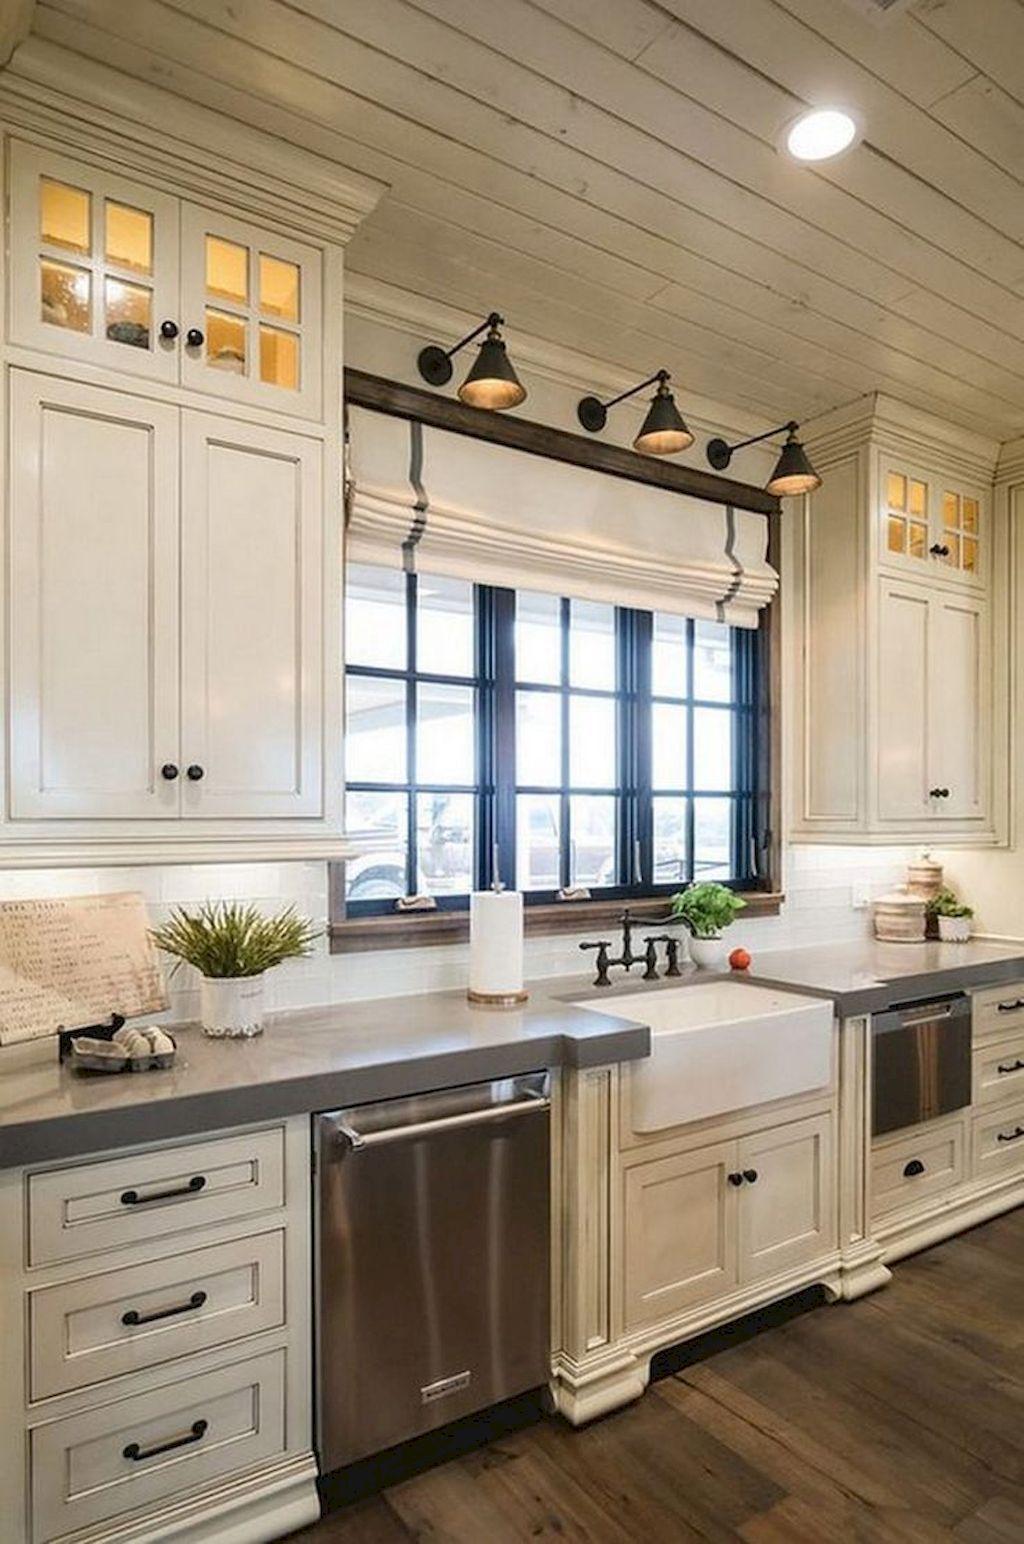 Ideas for kitchen decor   Clean Rustic Kitchen Decor Ideas  Rustic kitchen decor Rustic